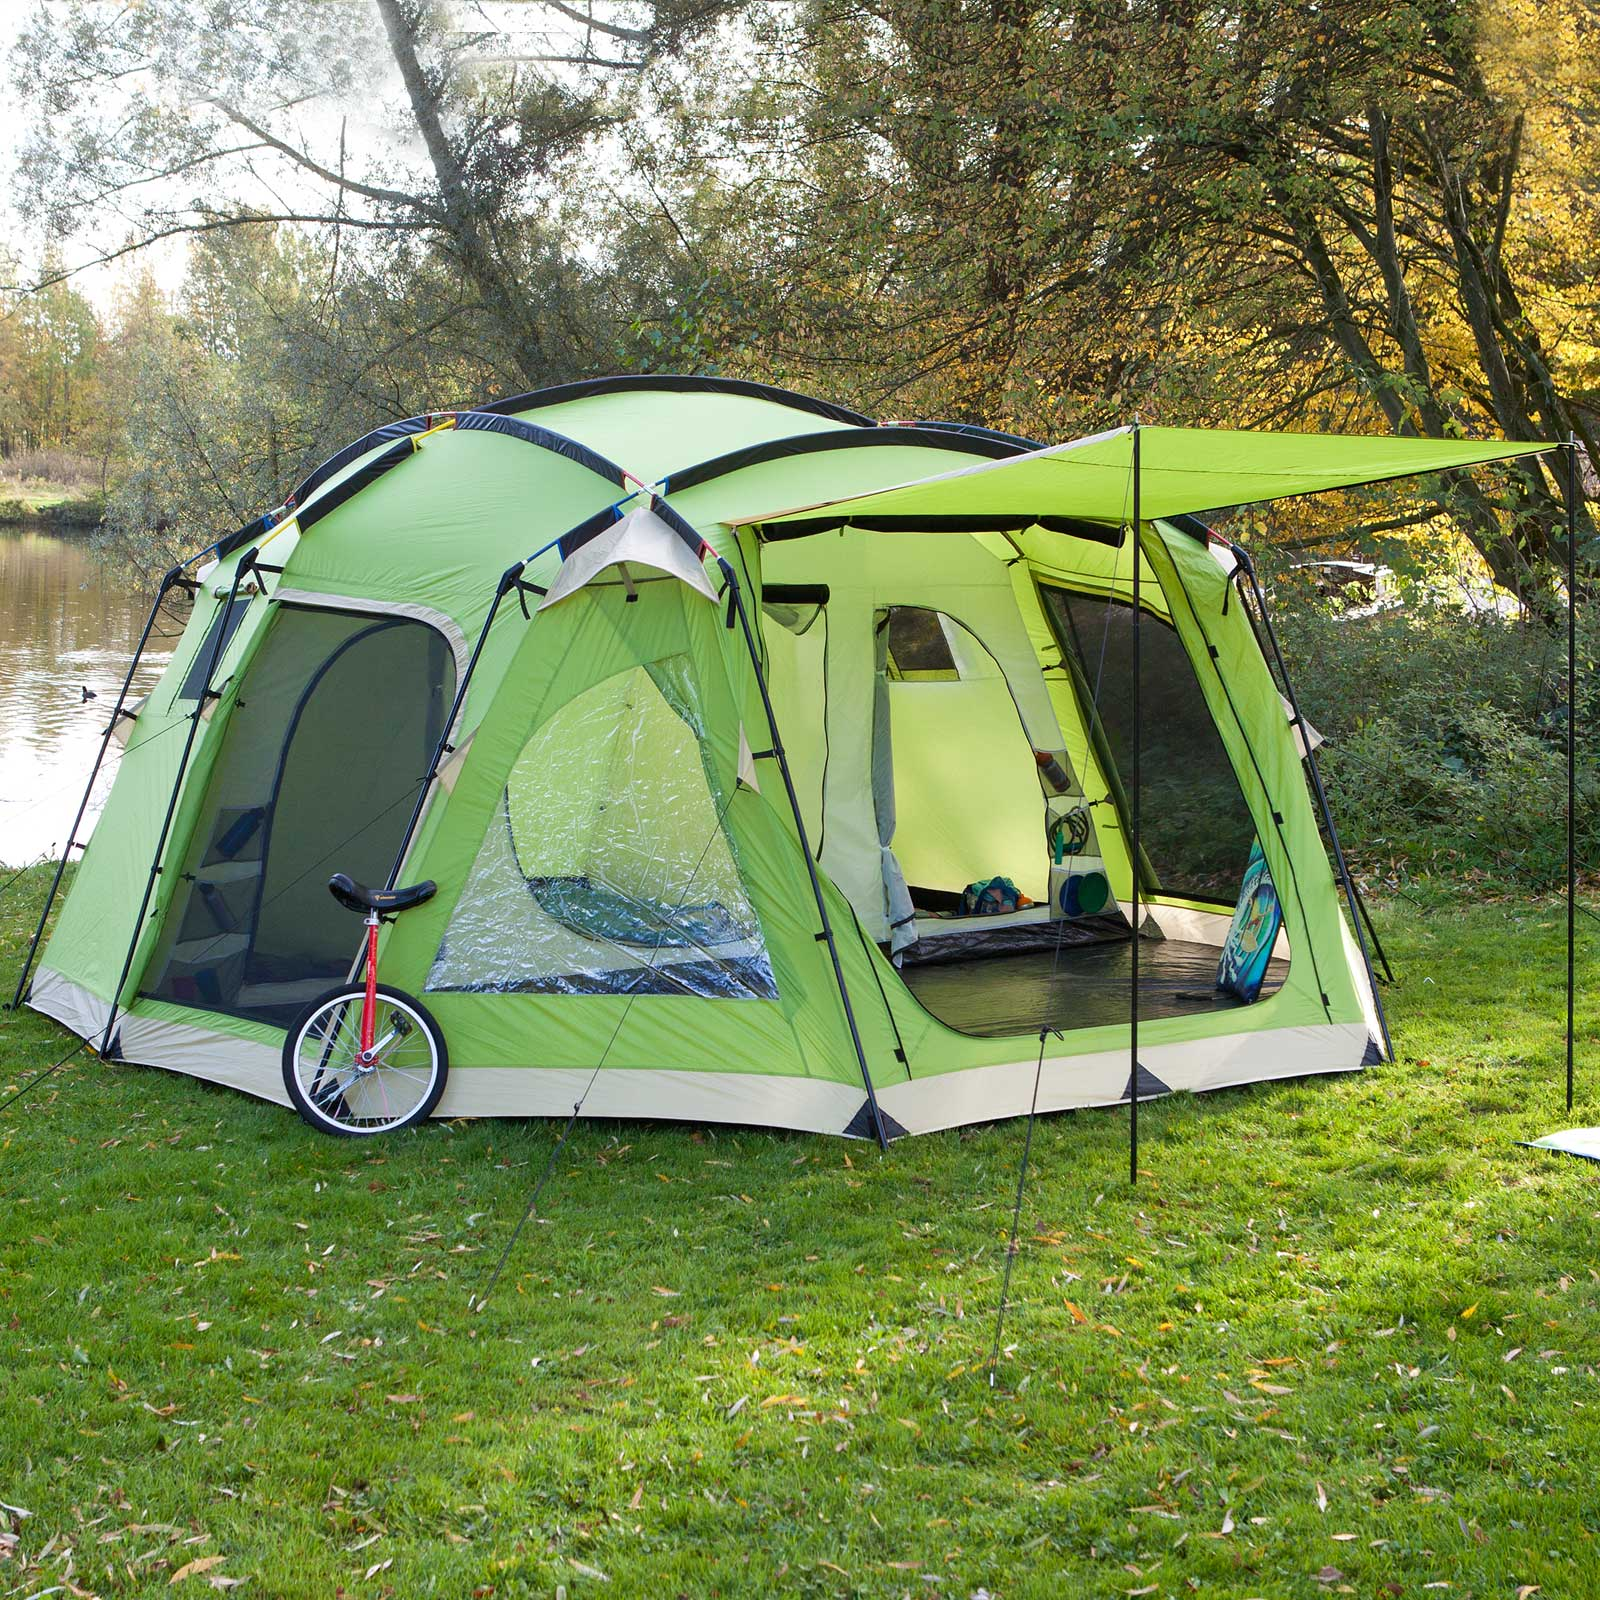 skandika copenhagen 6 8 personen familienzelt kuppel zelt moskitonetze blau gr n ebay. Black Bedroom Furniture Sets. Home Design Ideas